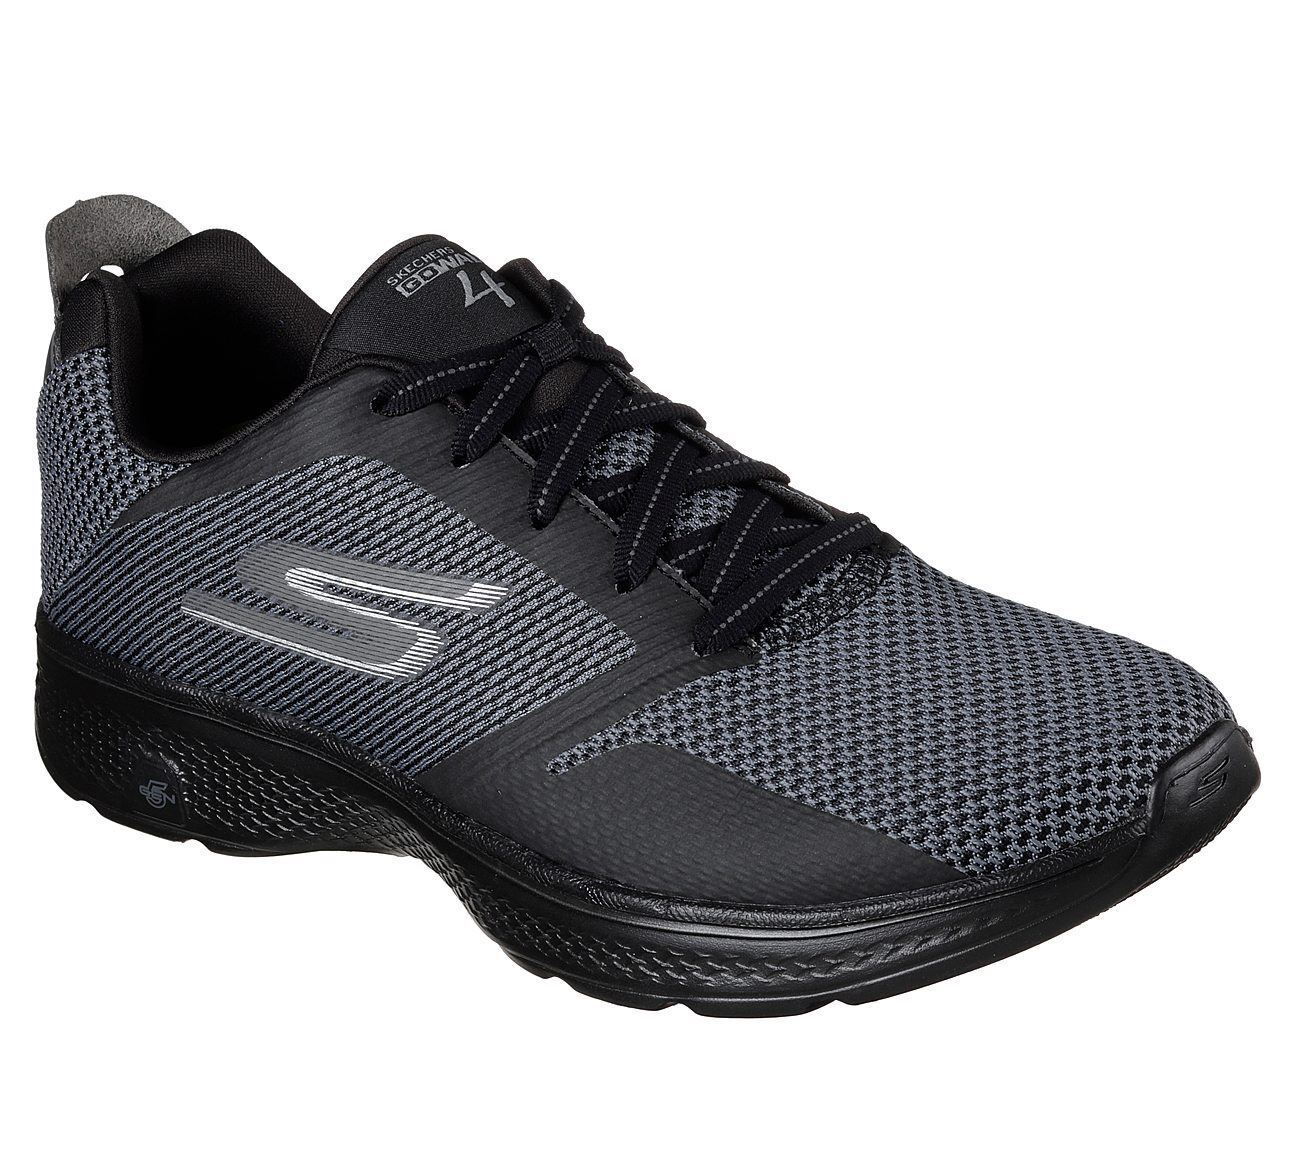 SKECHERS - Hombre's Go Walk 4 - SKECHERS Elect Smart Casual Trainers in Negro/Gris 41f4b6